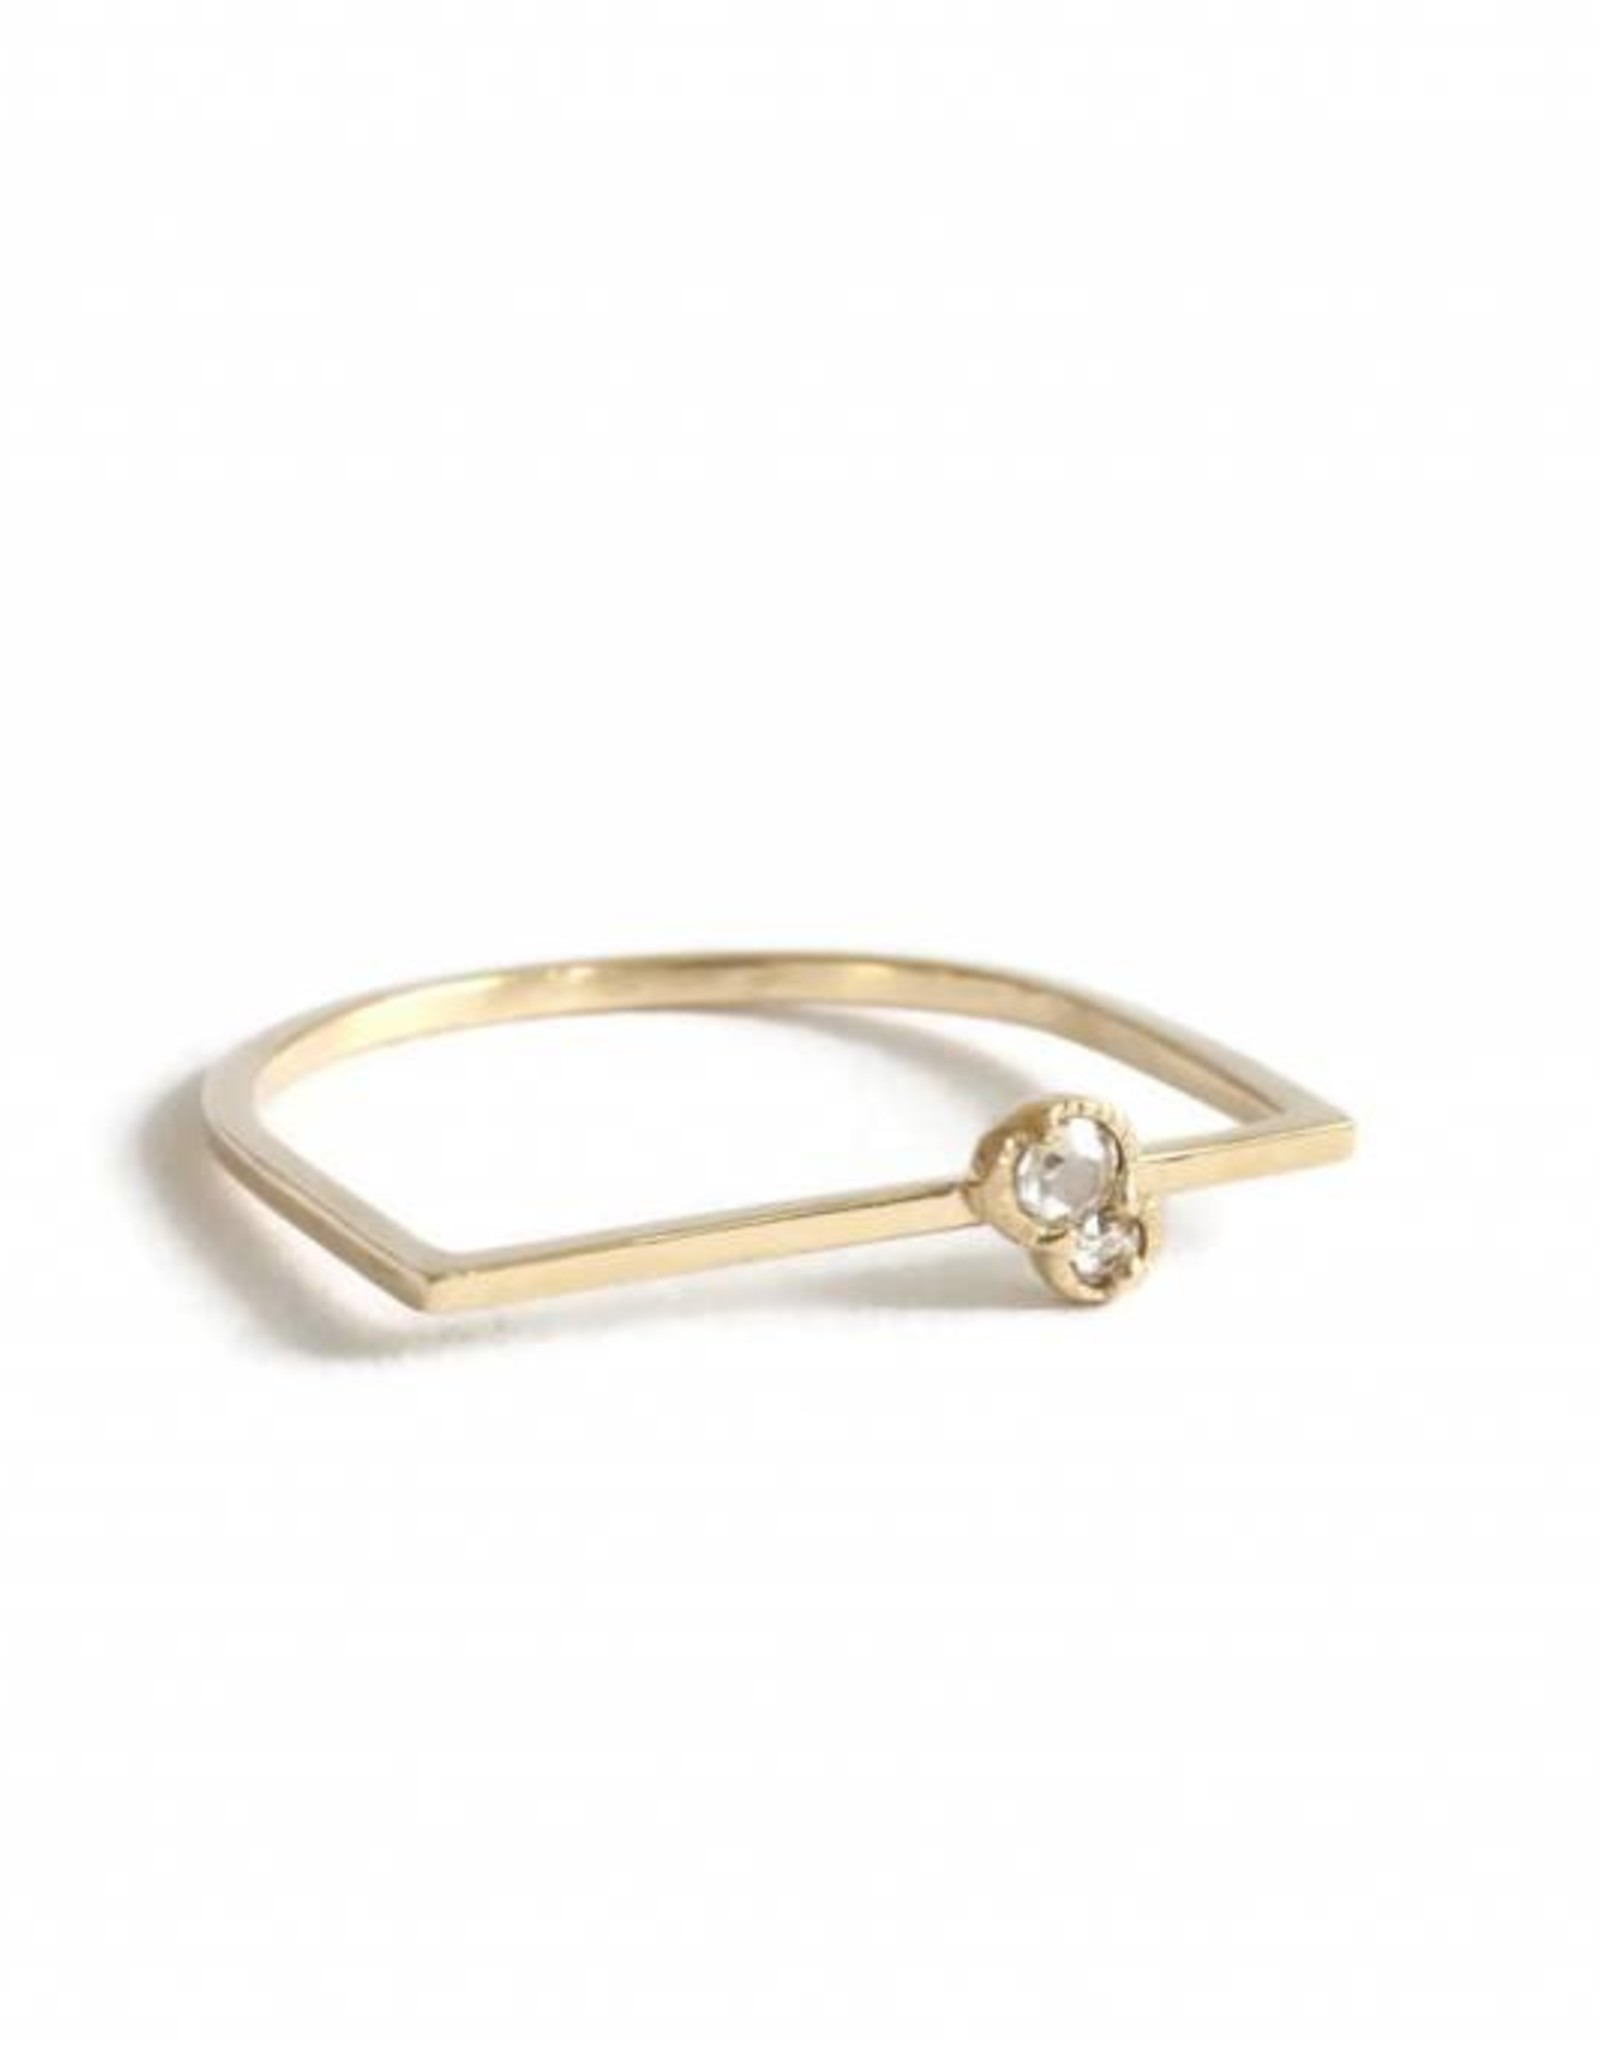 Lio & Linn Twin Diamond Ring